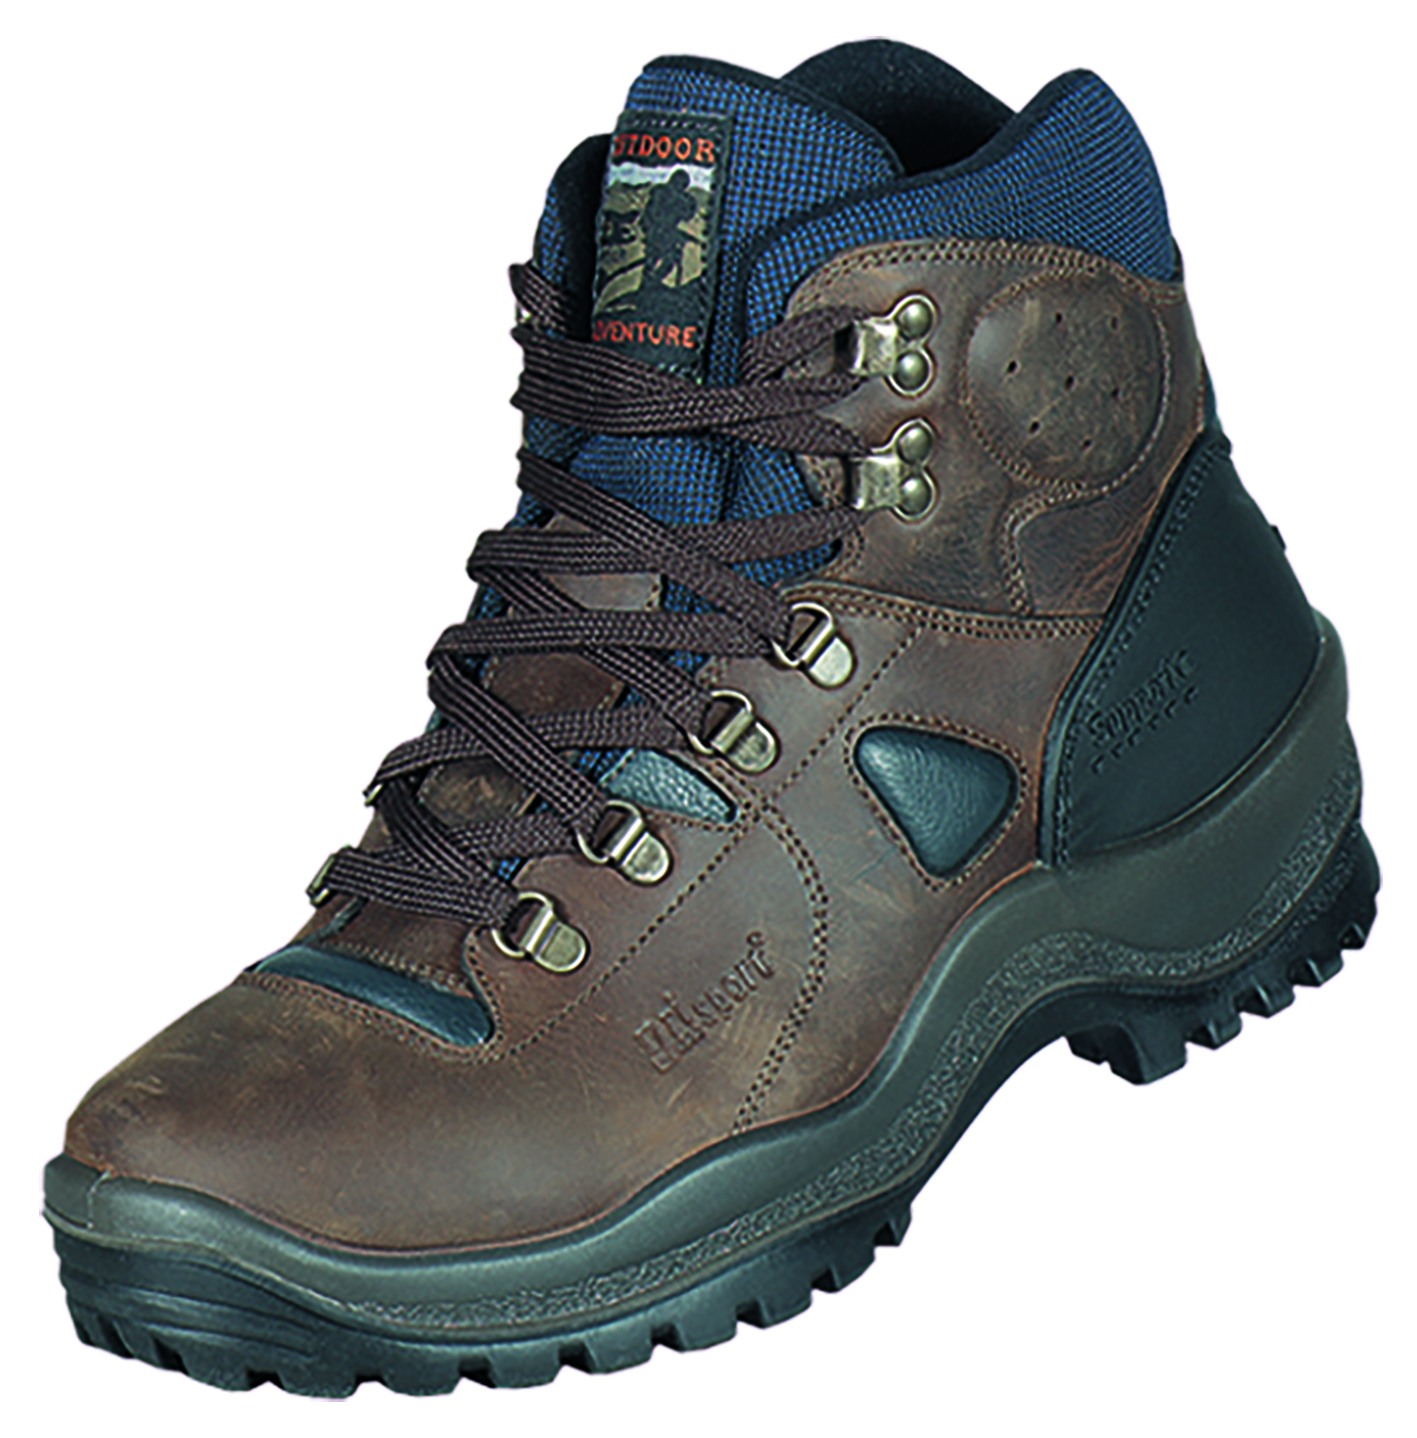 grauport Wander-Trekking Trekkingstfl Trekkingstfl Trekkingstfl Braun 629 Var 9 marro 5e4d61